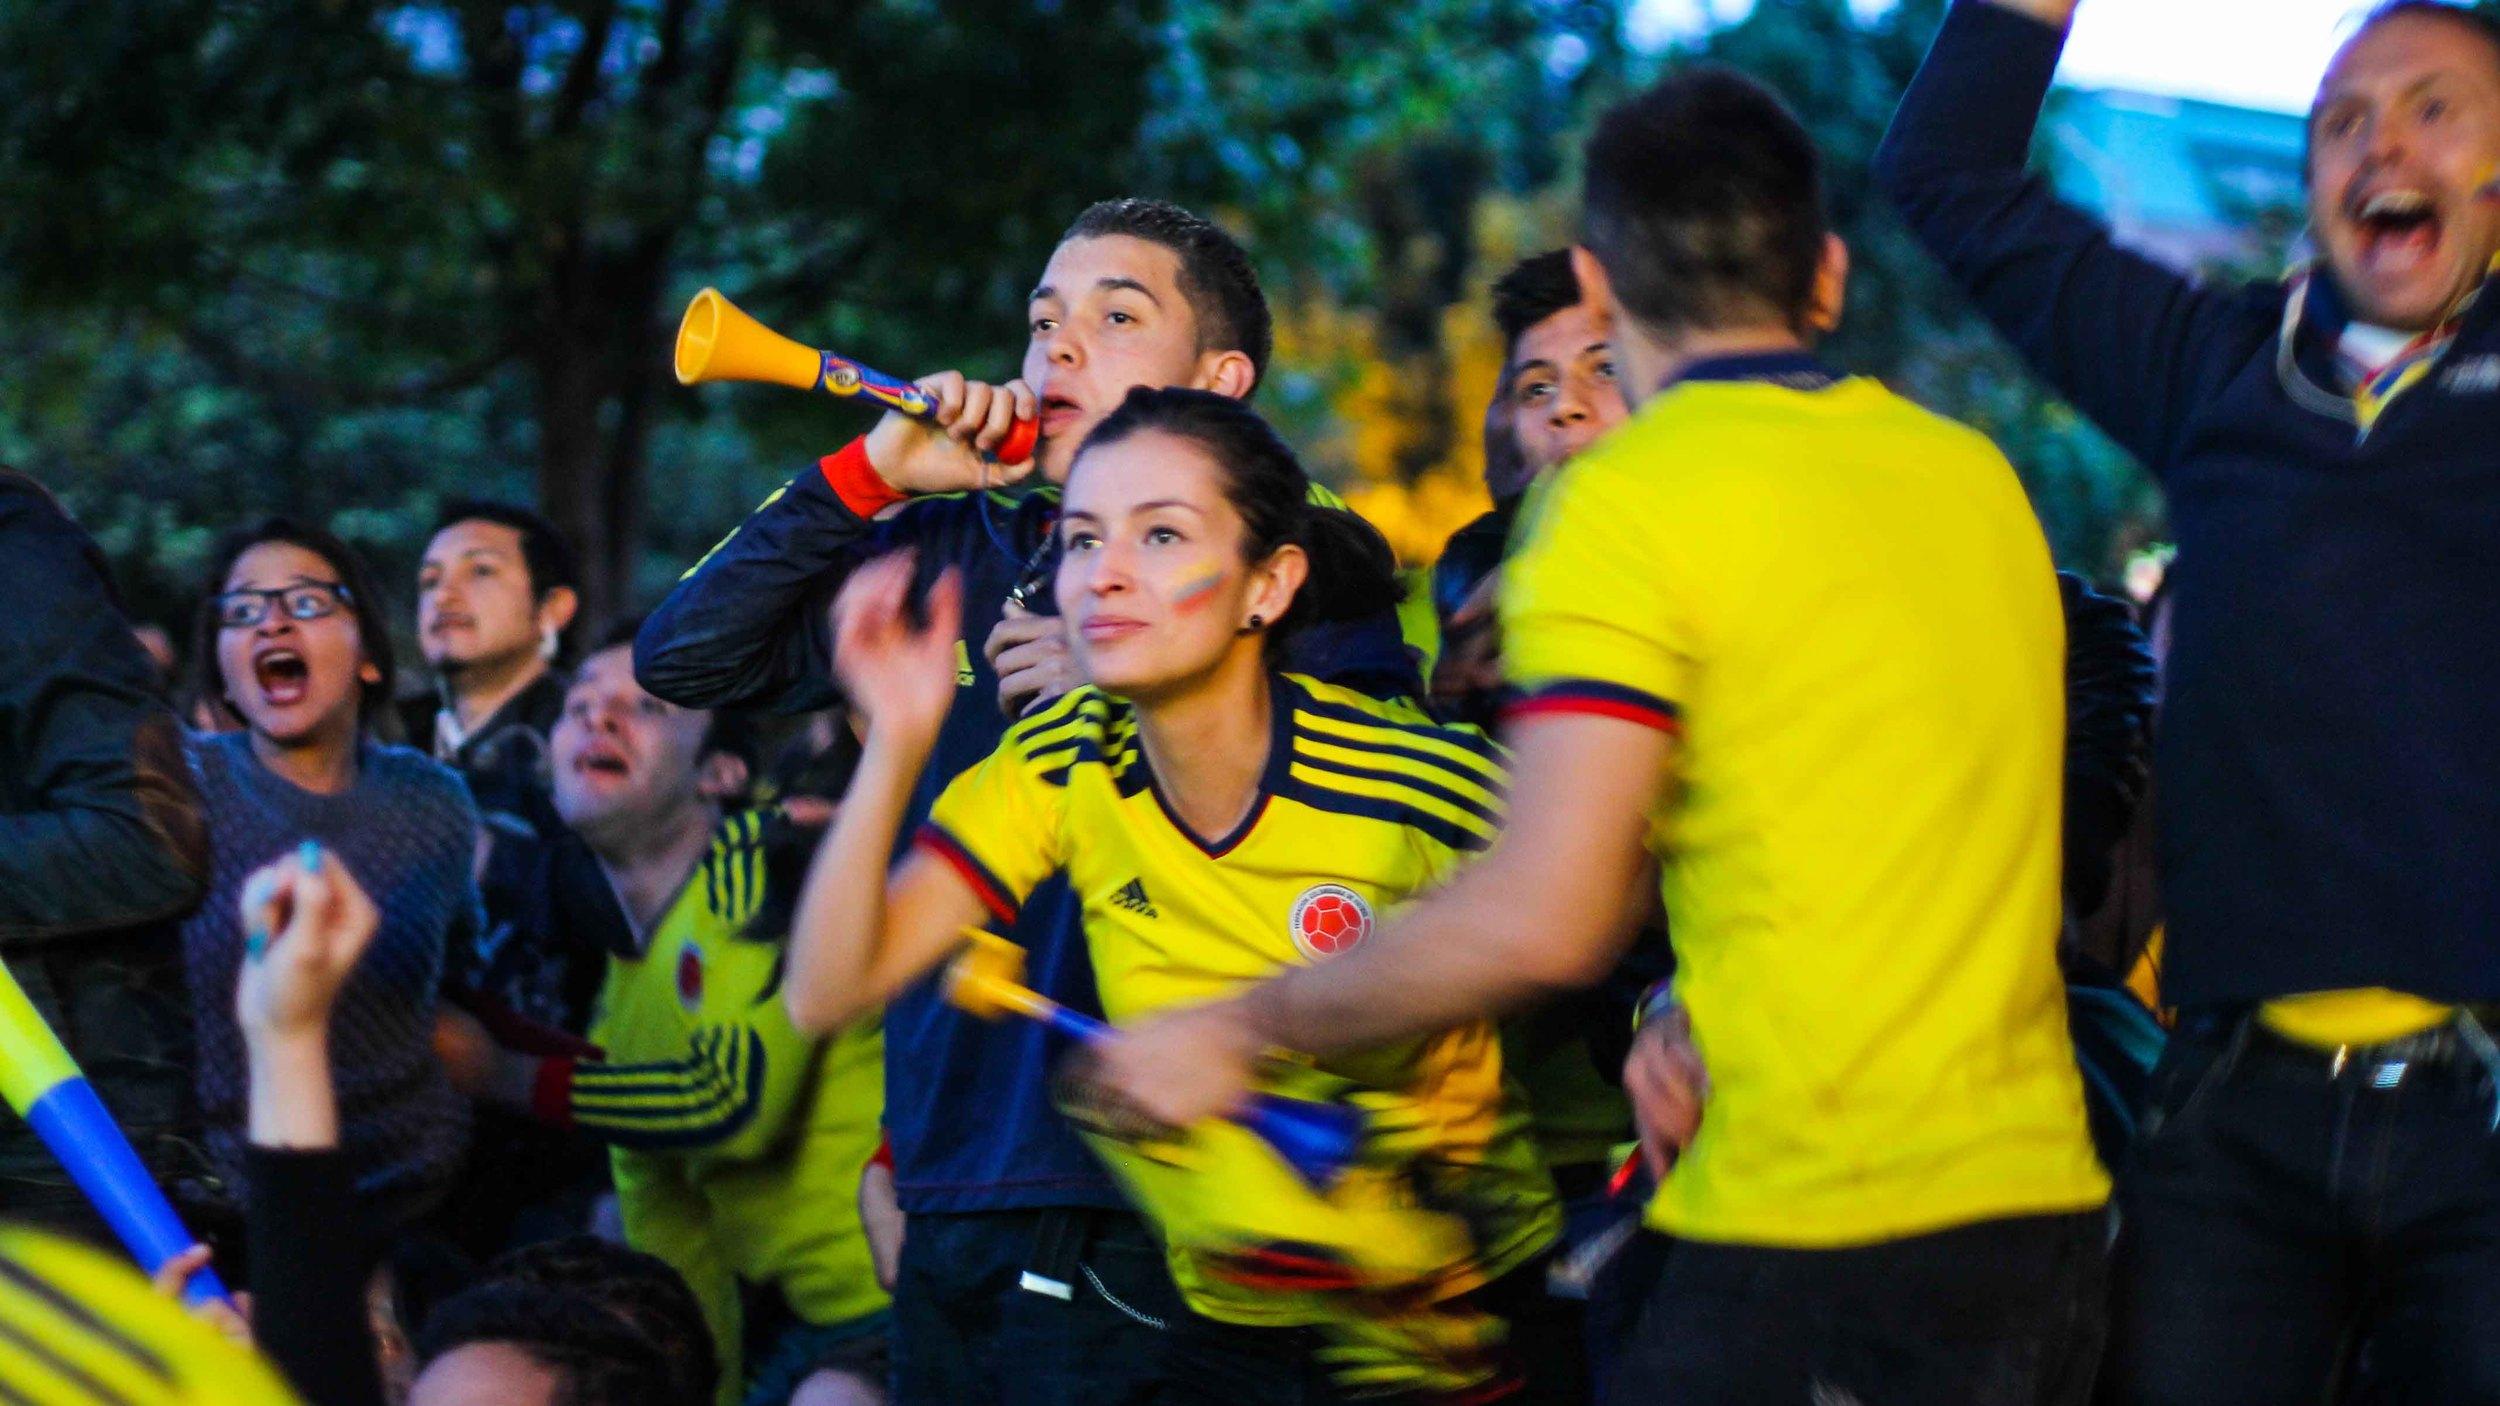 Colombian women, excellent. Colombian women in football shirts, hermosísima.